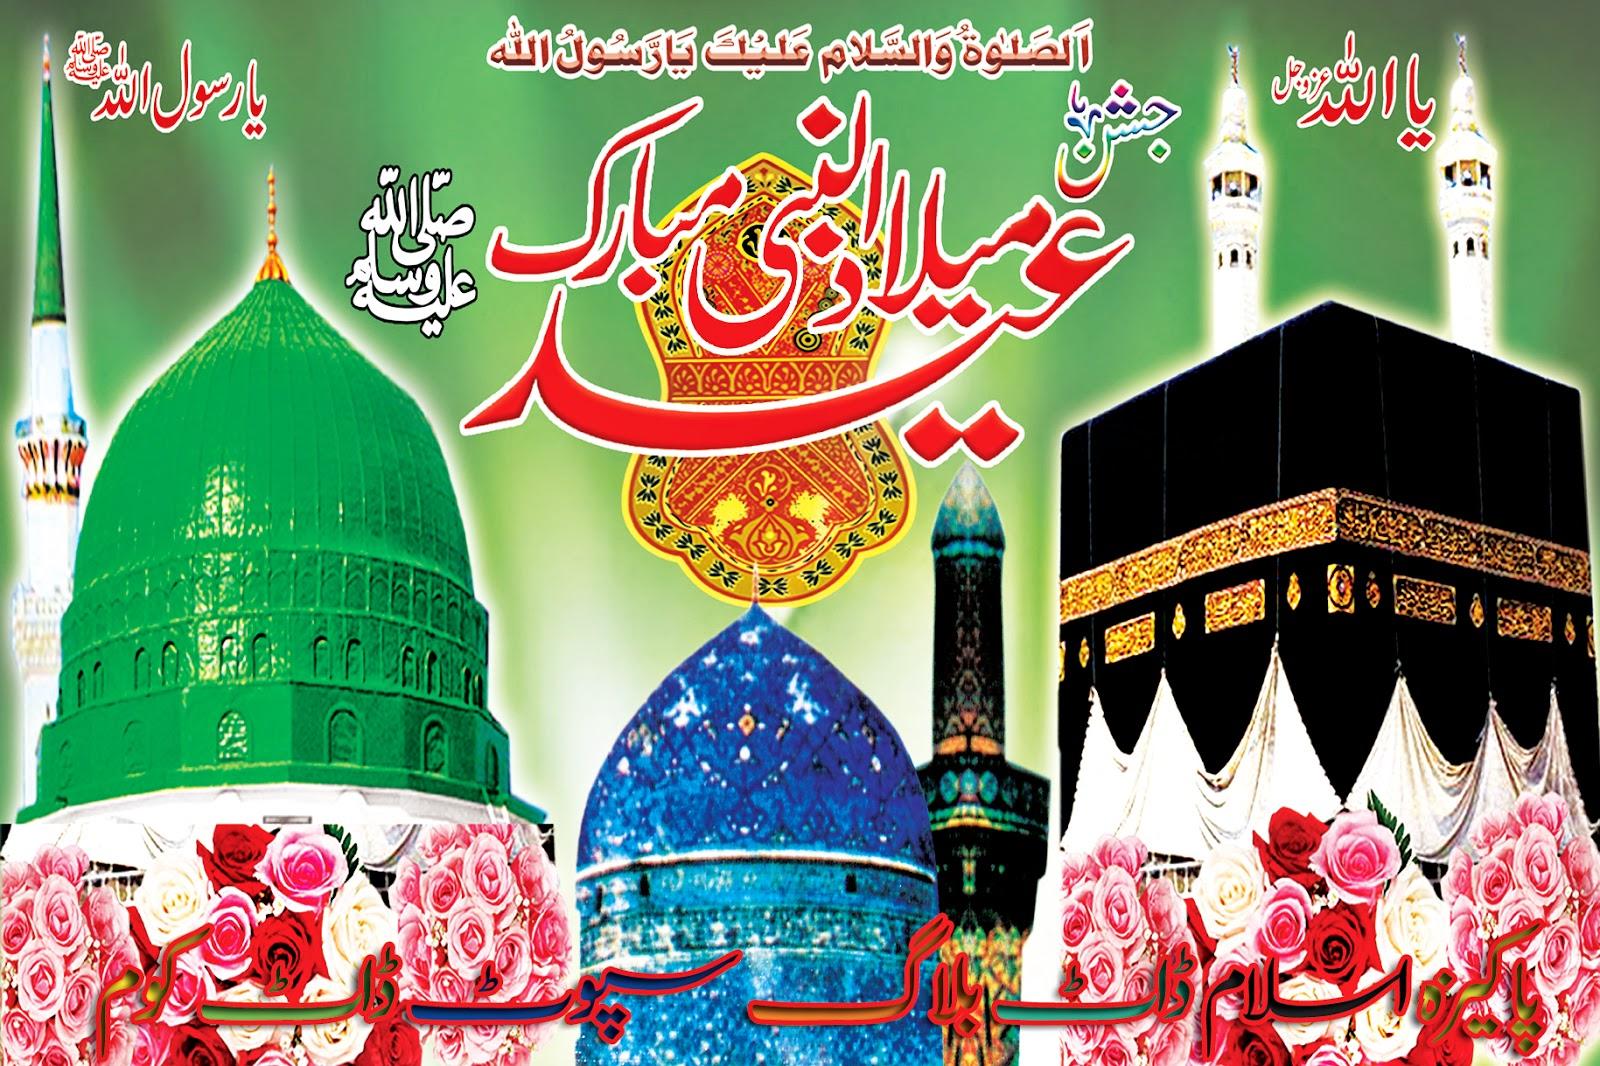 Best naat khawan live on geo 12 rabi ul awal special for 12 rabi ul awal 2014 decoration